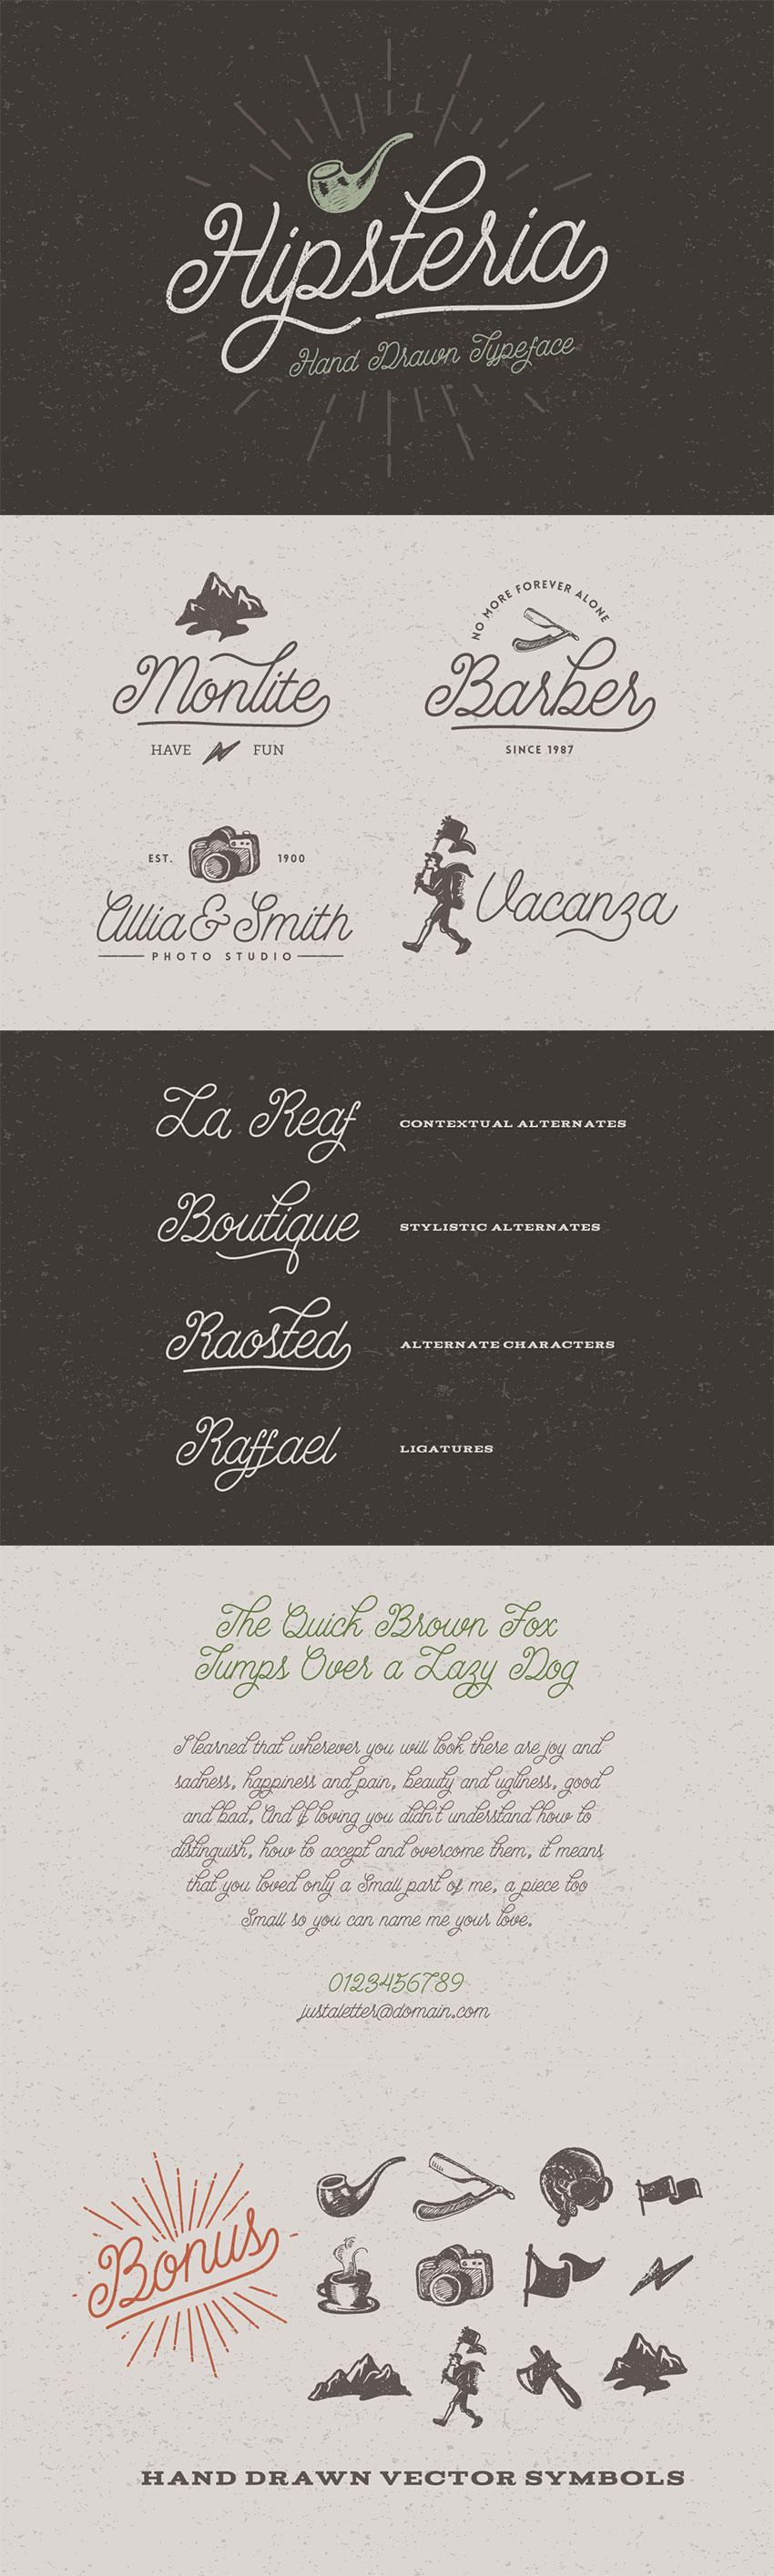 Drawn typeface hipsteria Prada 4 $20 Fonts Script